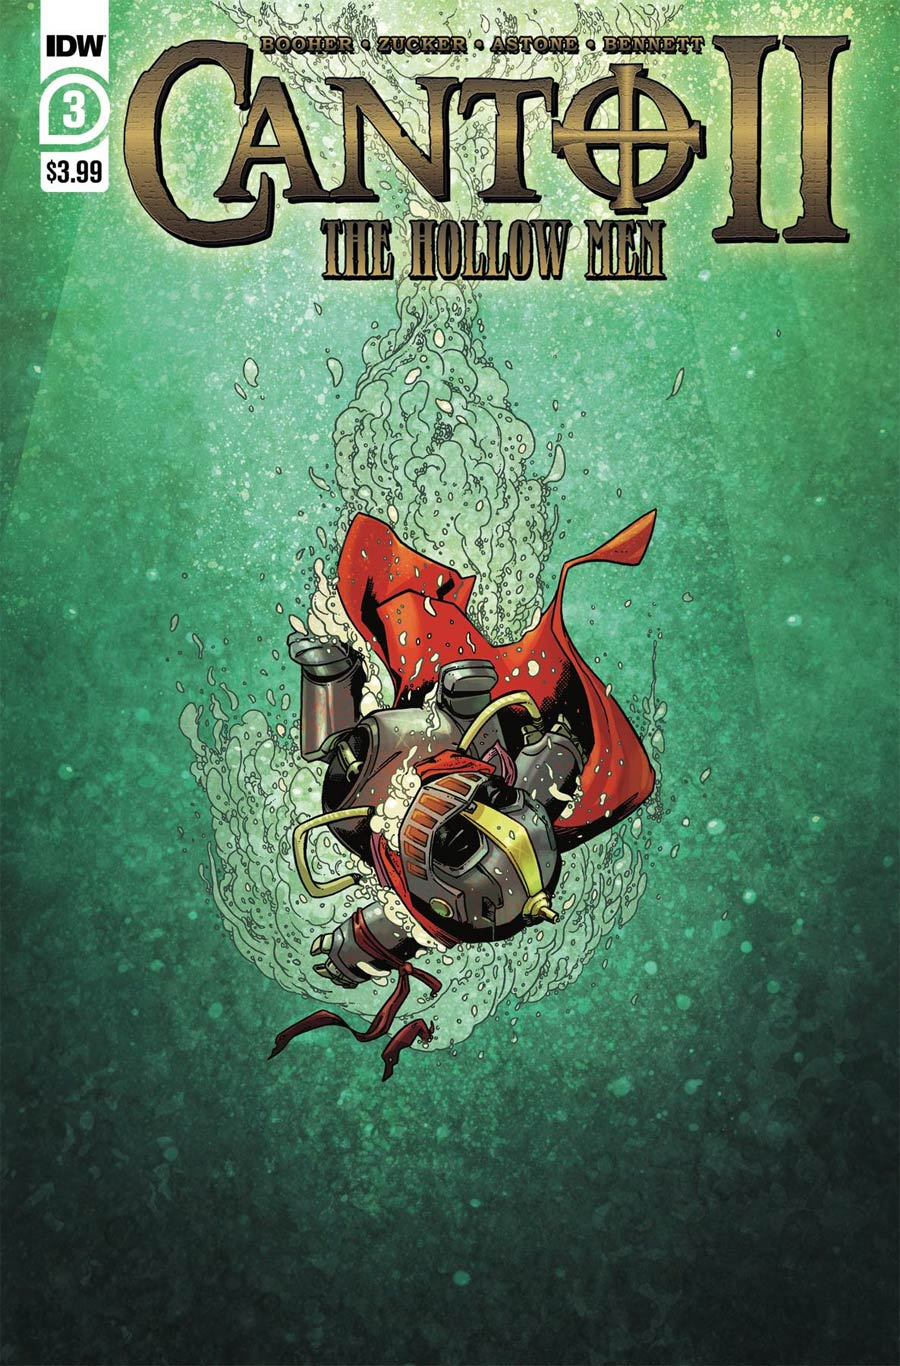 Canto II Hollow Men #3 Cover A Regular Drew Zucker Cover